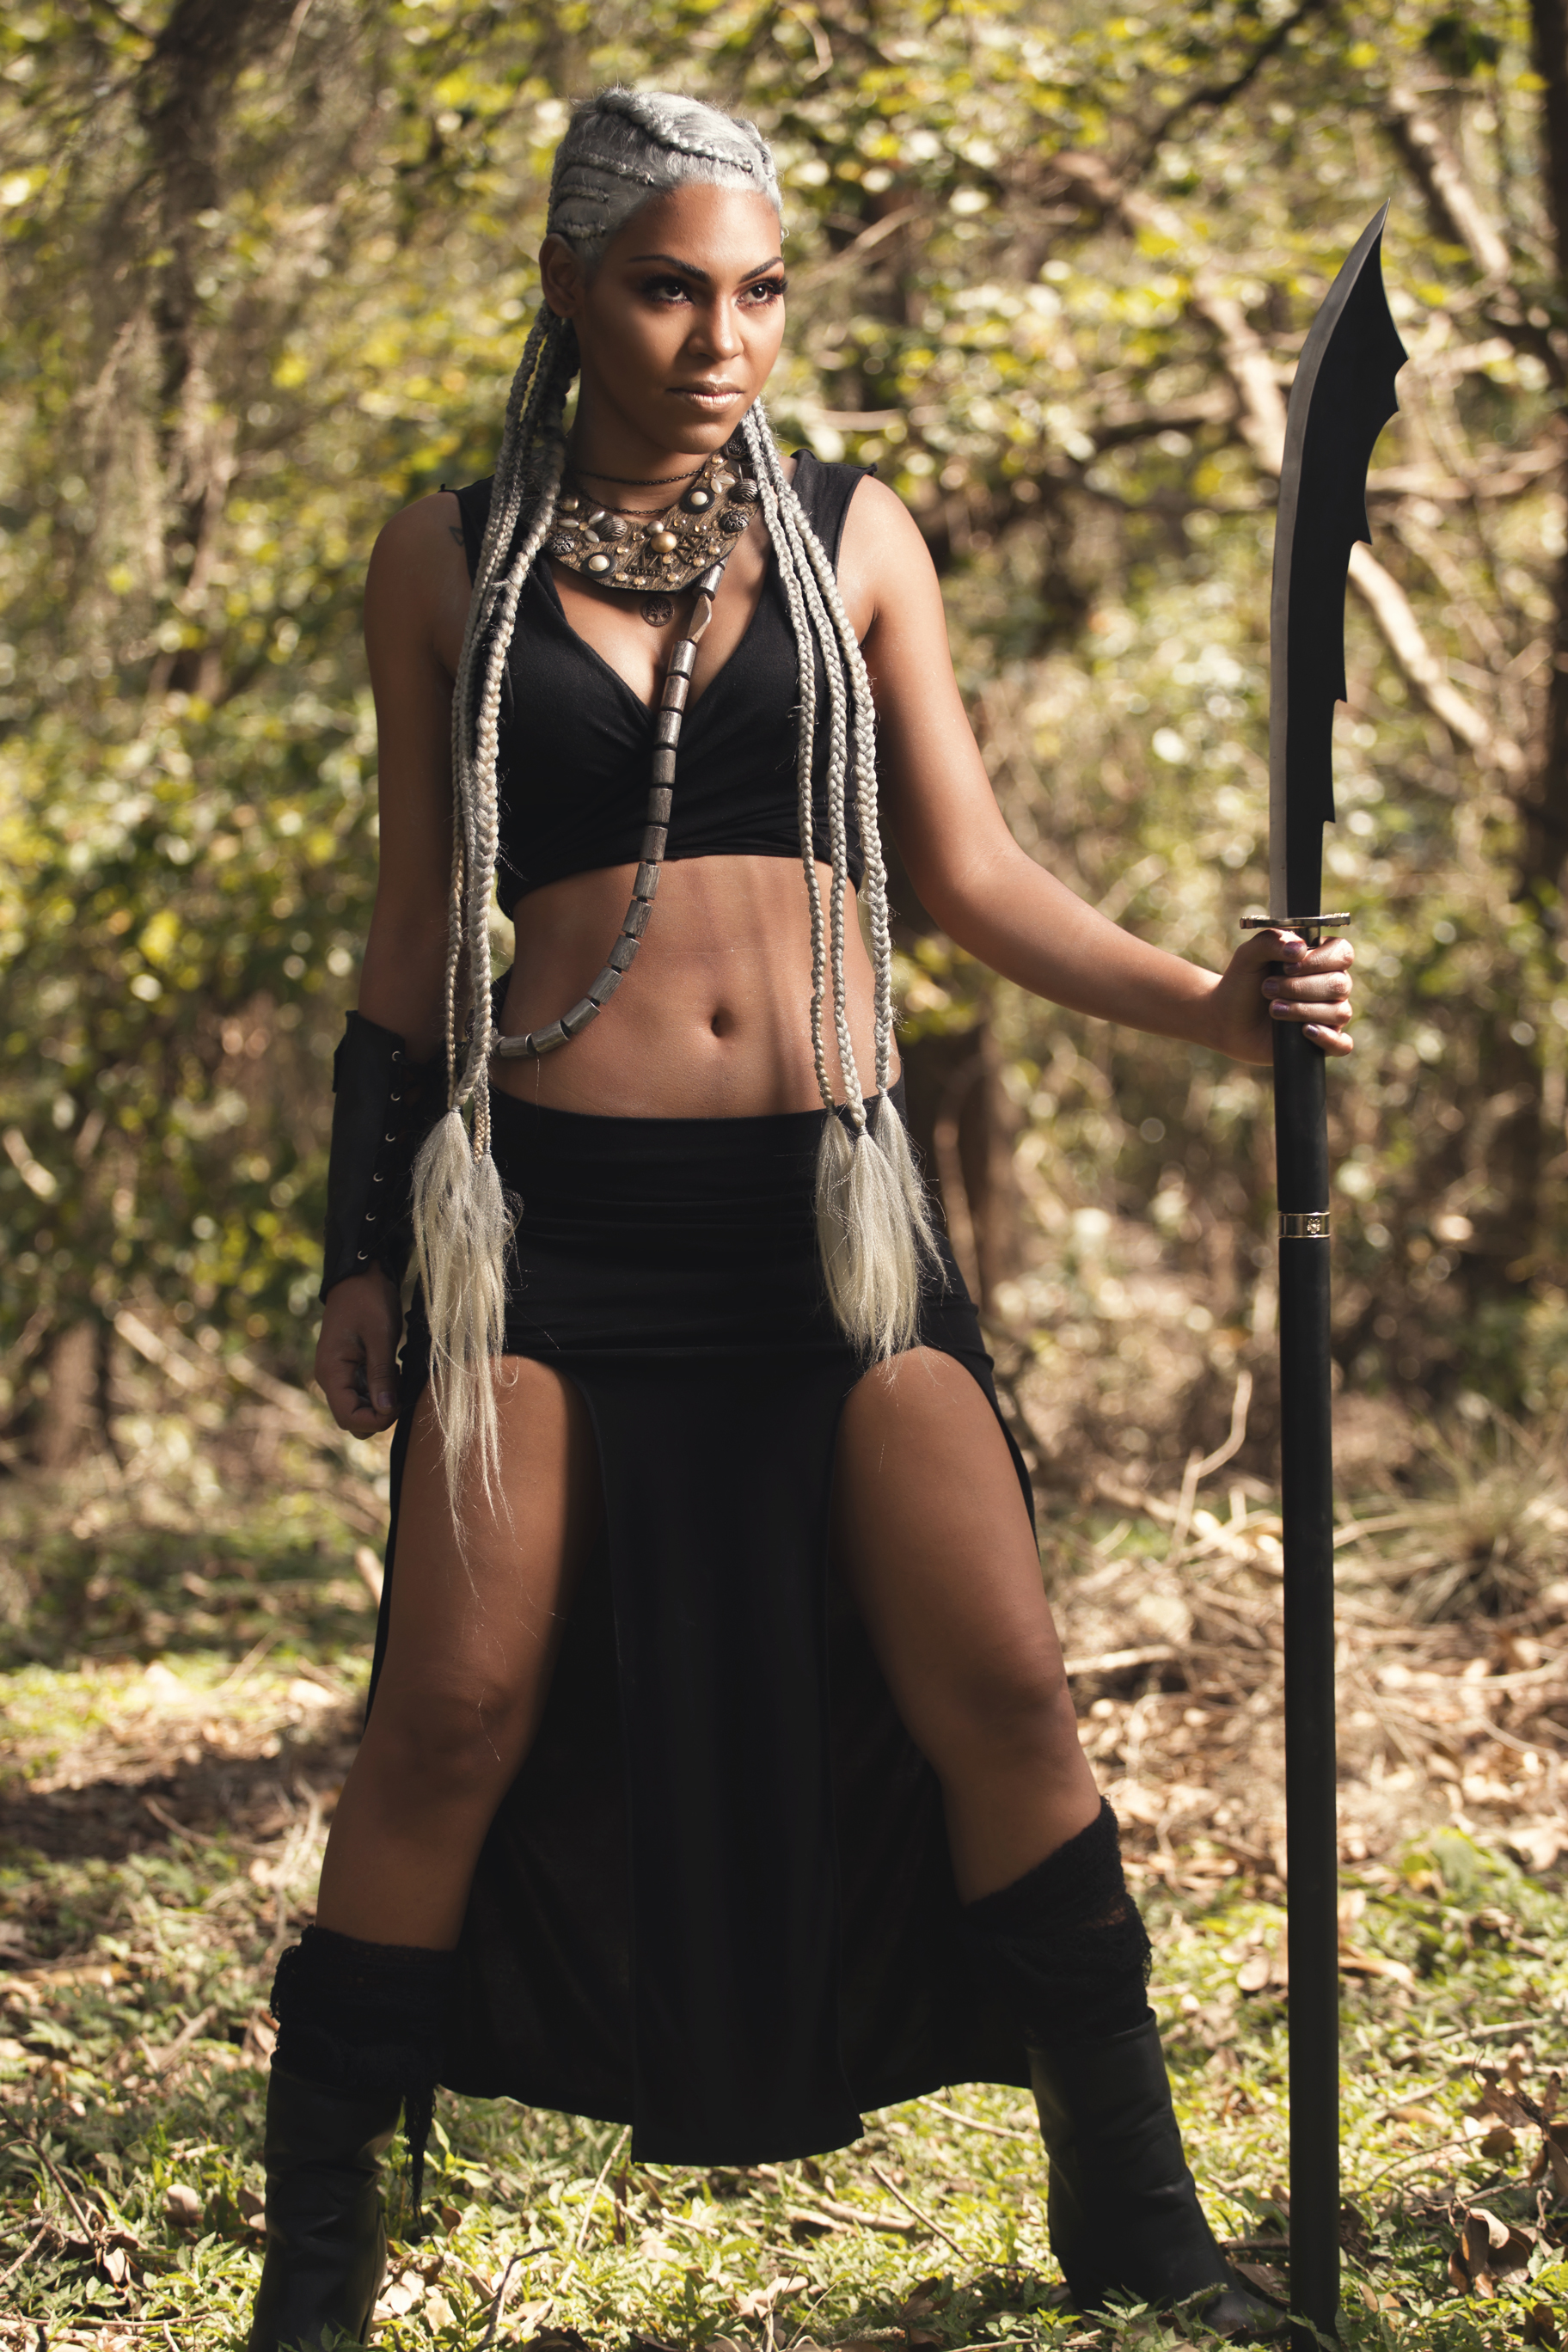 character-chamber-photography-warrior-female6.jpg